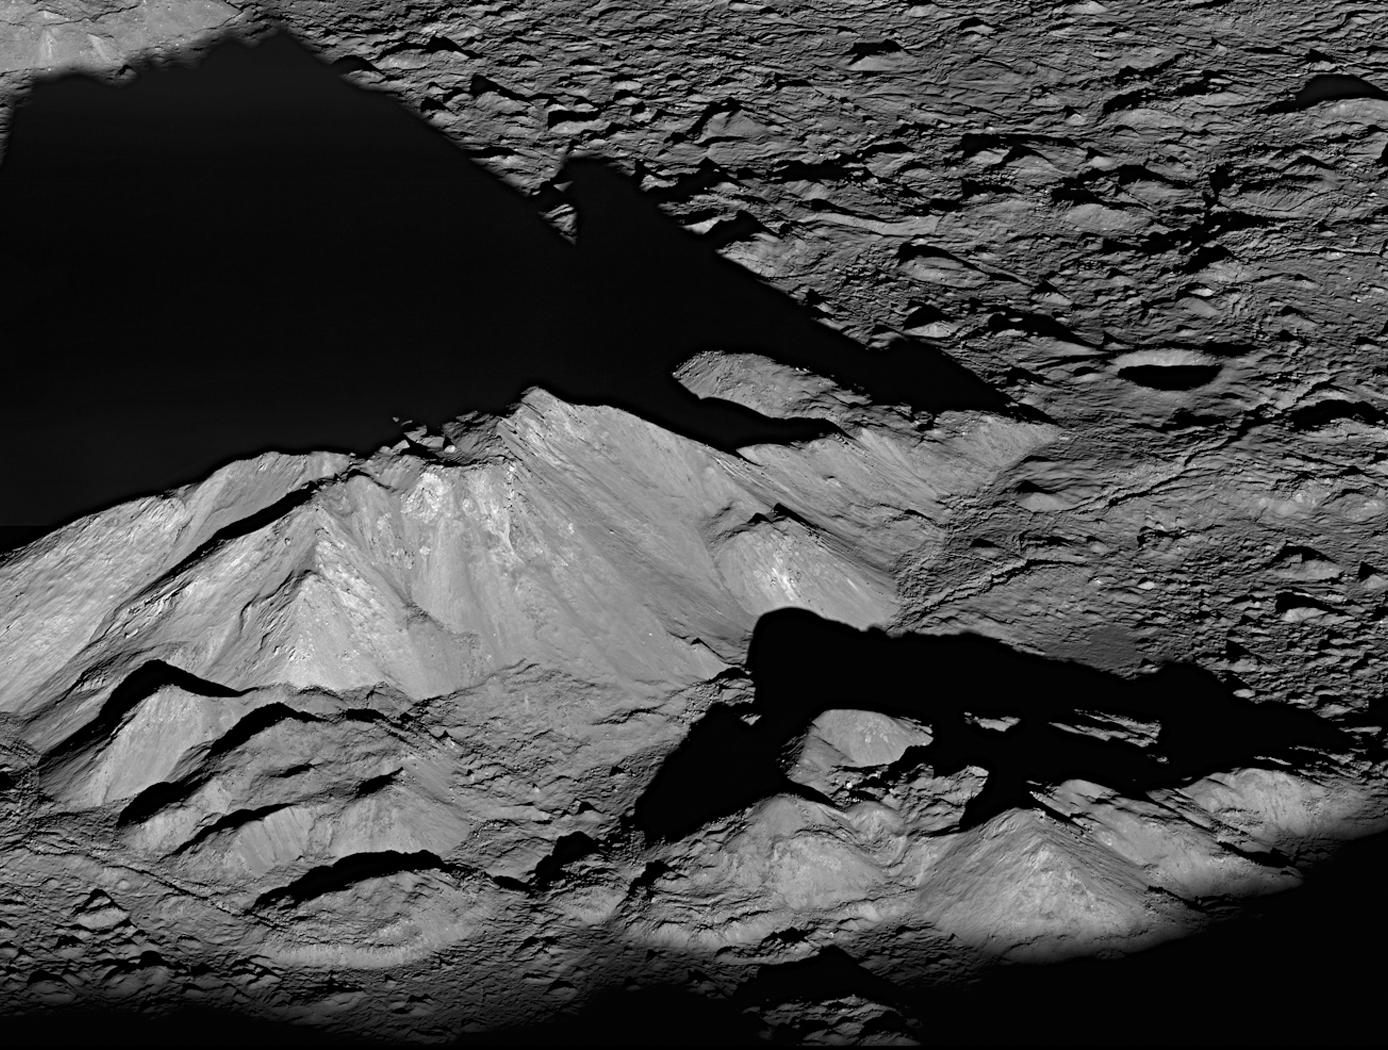 Tycho Crater's Peak; Credit: NASA Goddard/Arizona State University